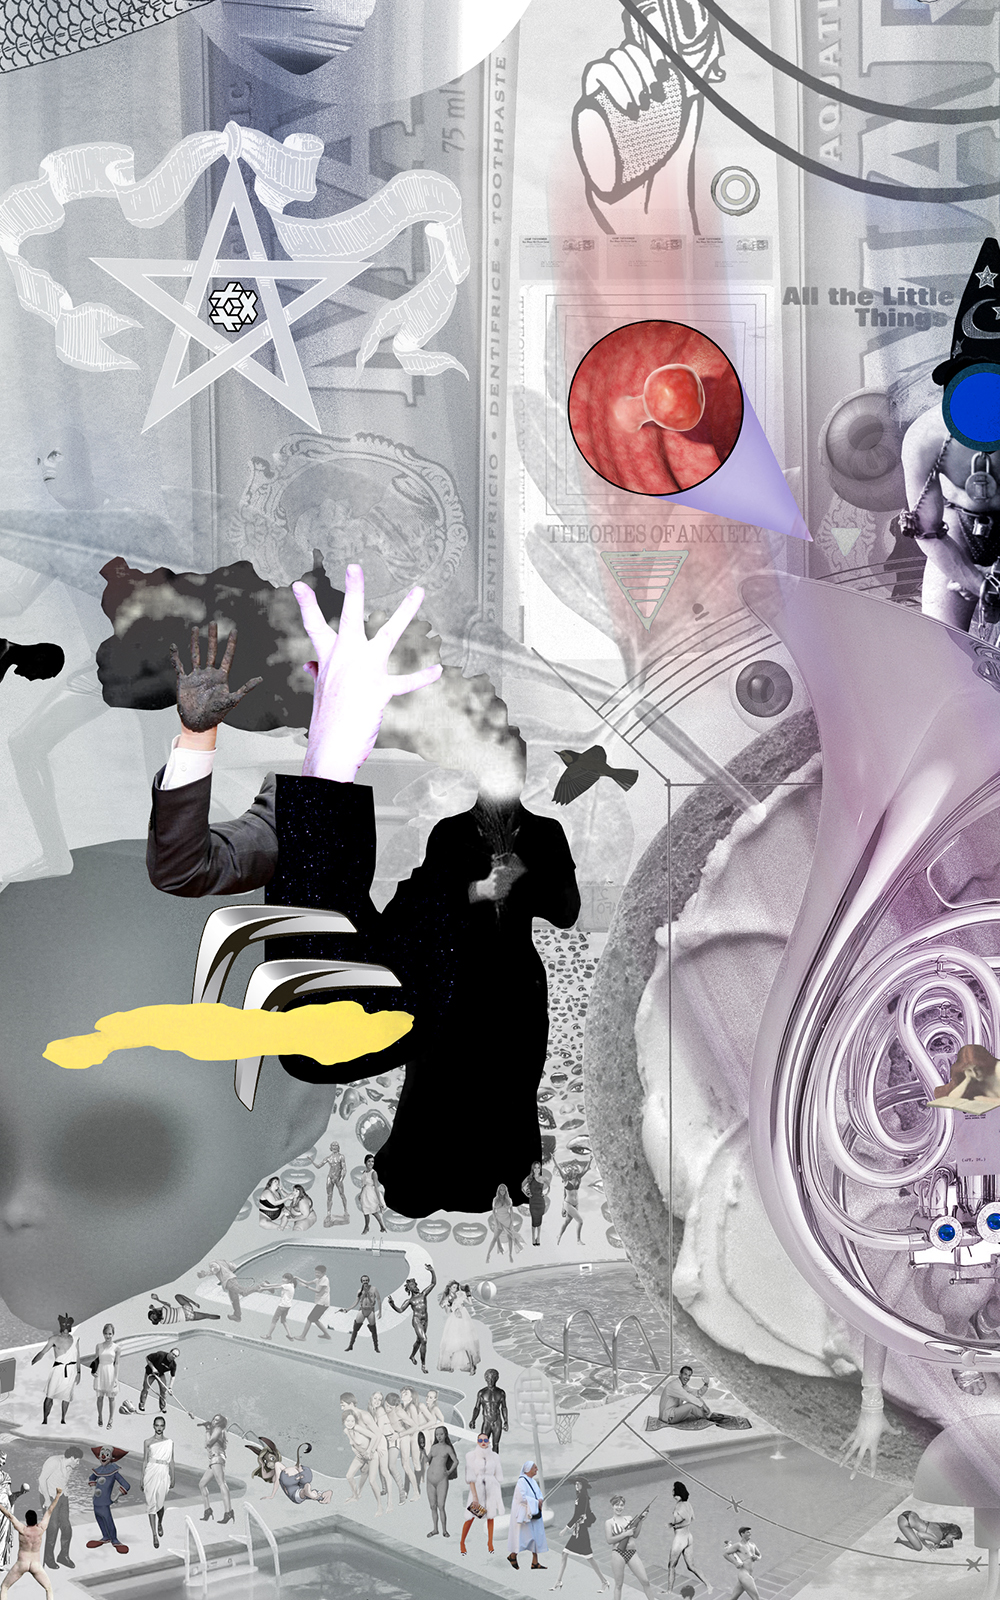 Case Simmons, Simmons & Burke, Uncertain Landscape, The Radicant, Hieronymus Bosch, Pigment Print, Digital Collage,Digital Art, Photoshop Collage, Contemporary Collage,Case Simmons Art, Collage Fine Art